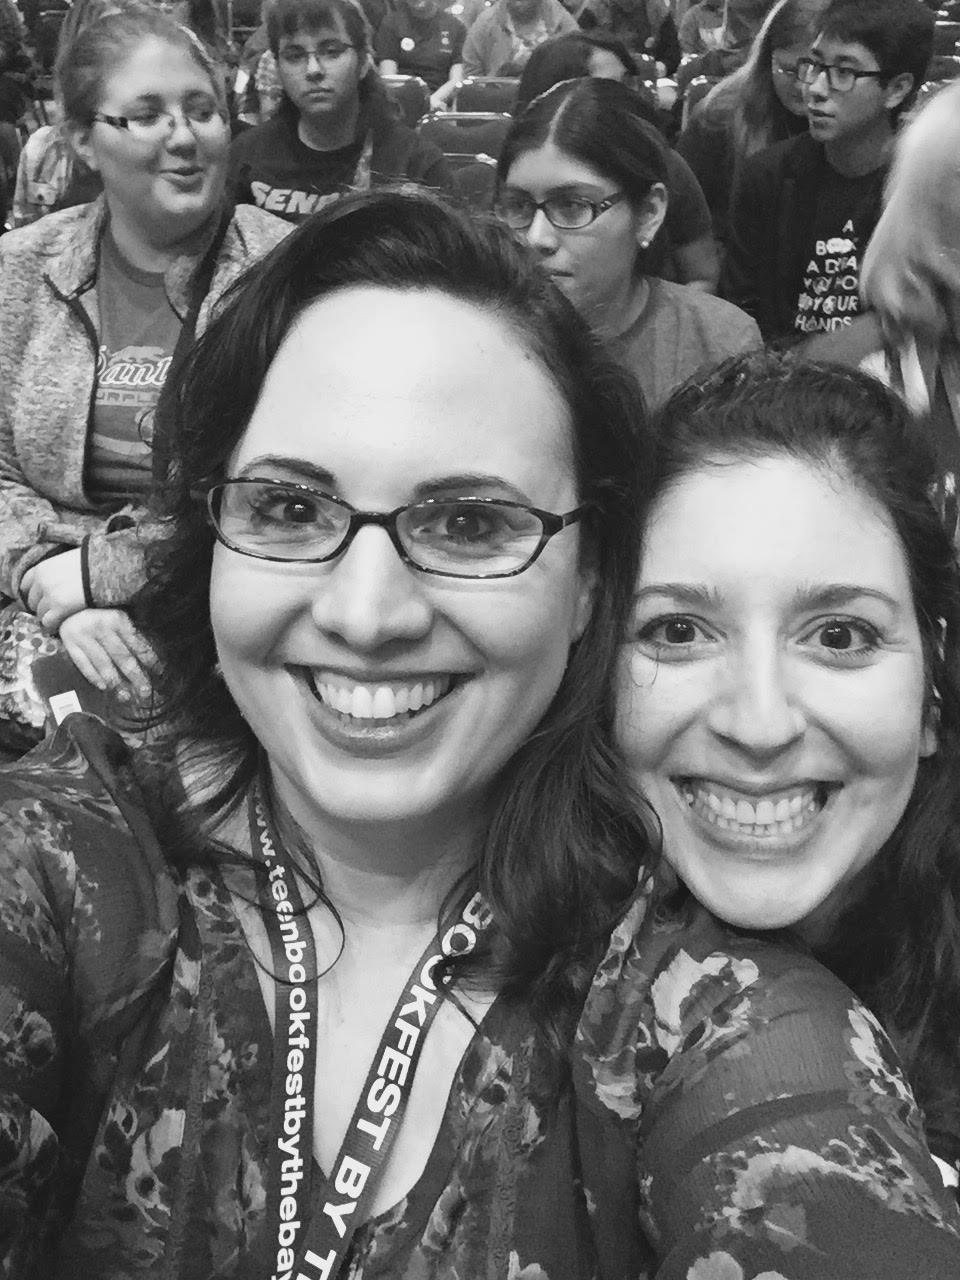 Authors Rose Garcia and Kristy Acevedo